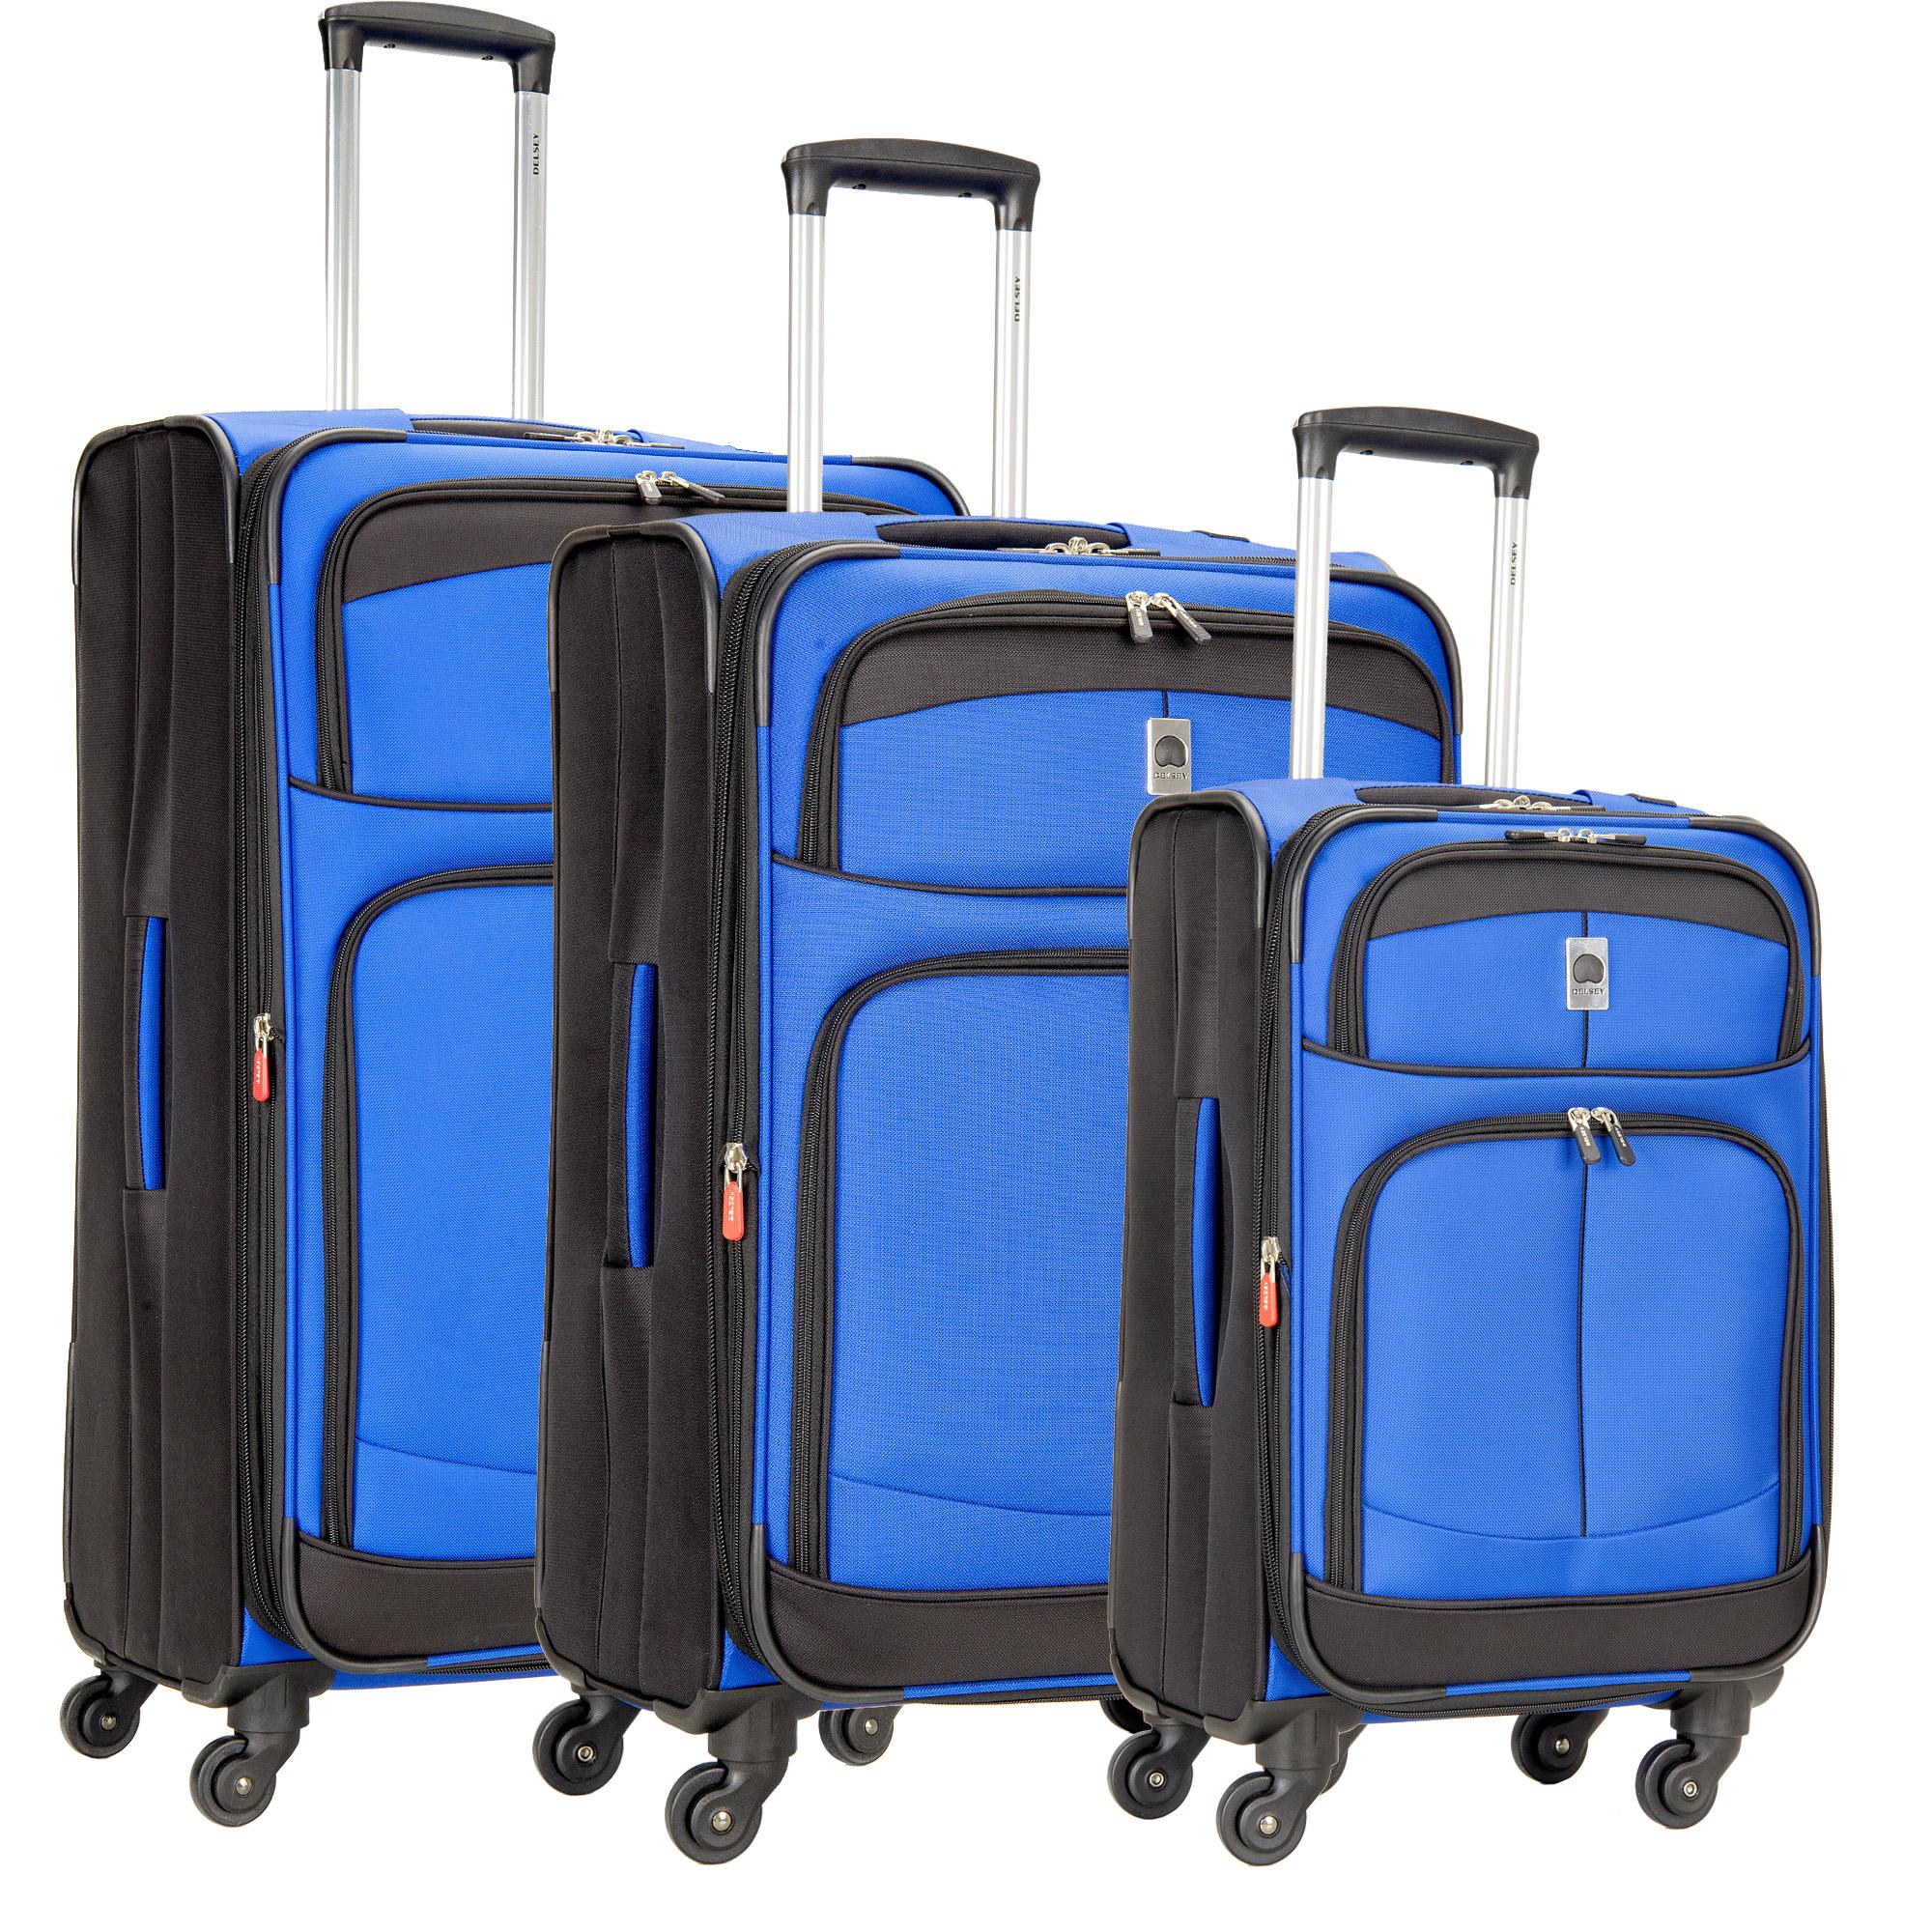 delsey agility softside 3 piece nested luggage set 21 25 29 martlocal. Black Bedroom Furniture Sets. Home Design Ideas